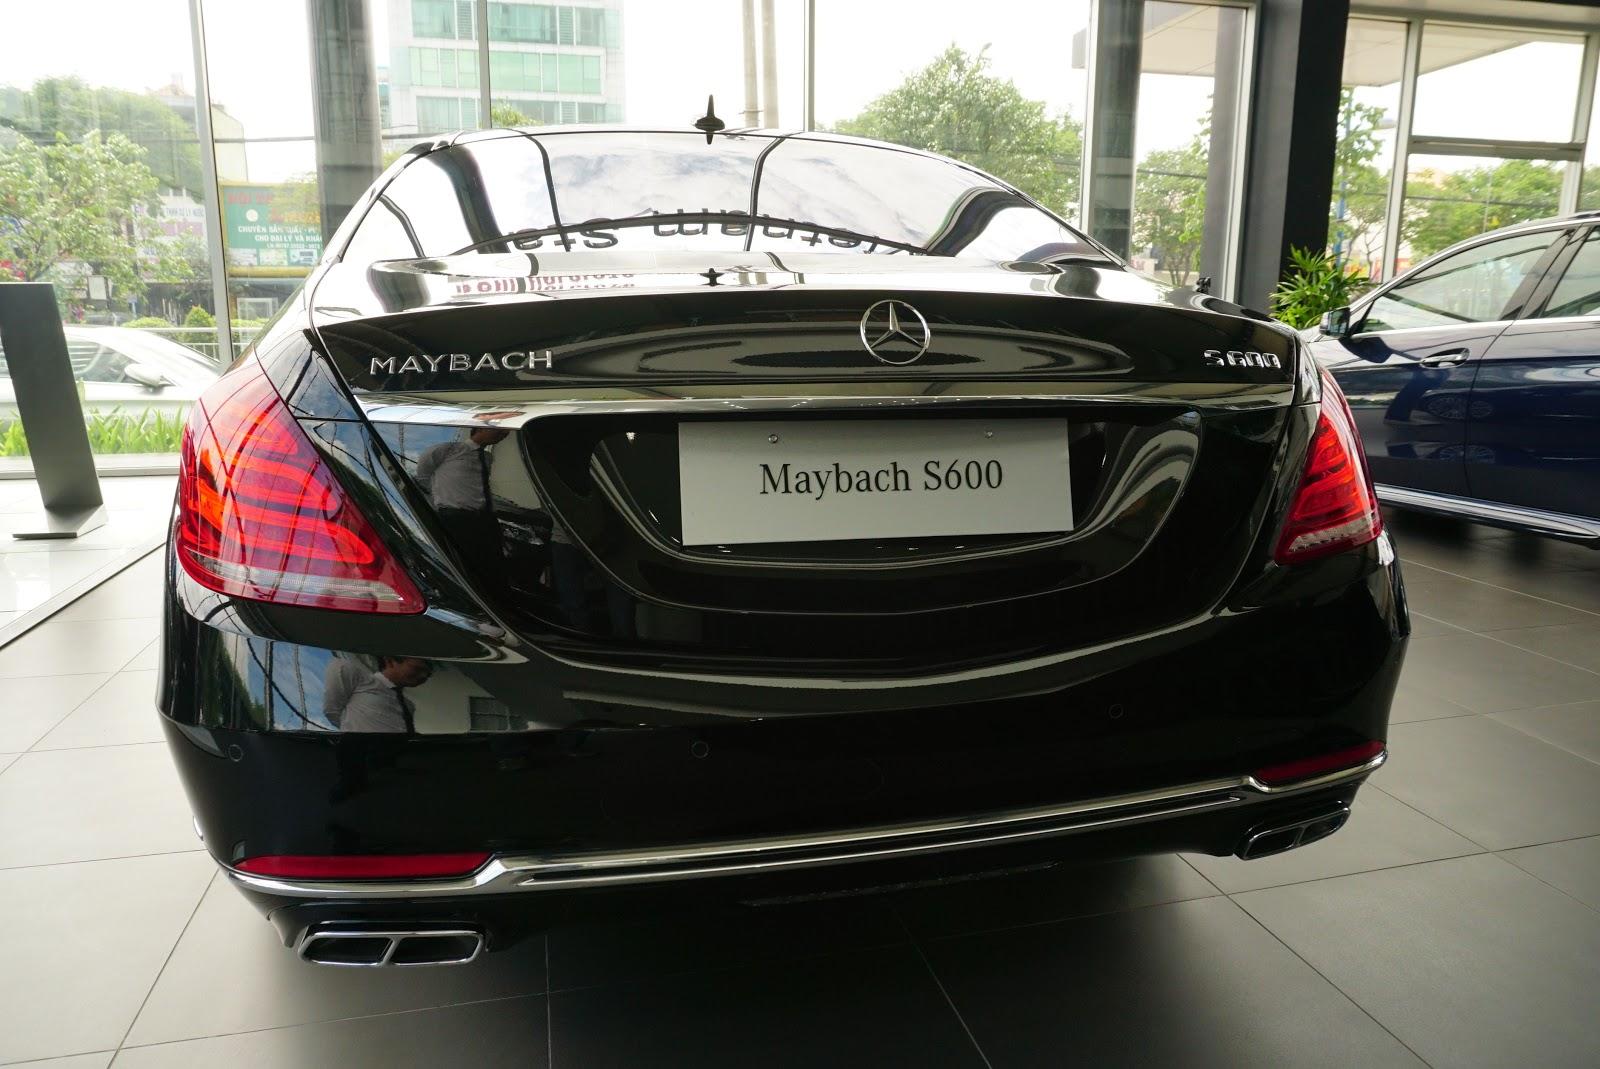 Ngoại Thất Xe Mercedes Benz S600 MAYBACH Màu Đen a04